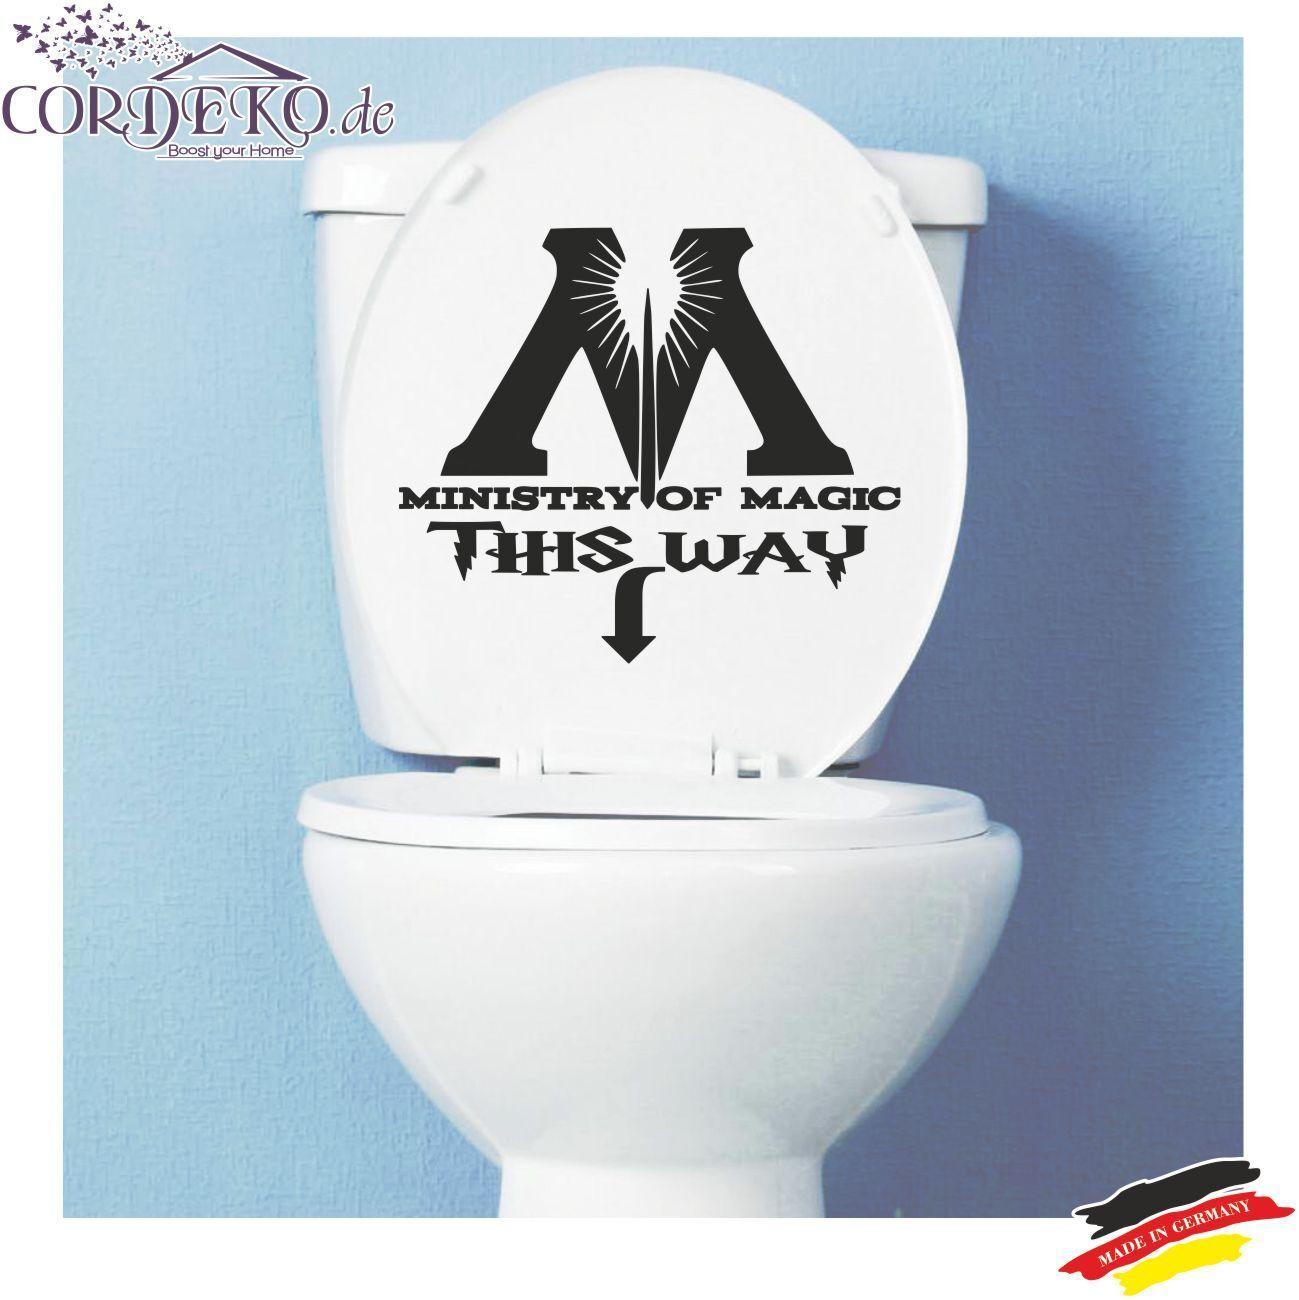 Details zu WC Aufkleber Toilette Bad ●︎ Ministry Of Magic ●︎ Funny  Wandattoo Folie Sticker